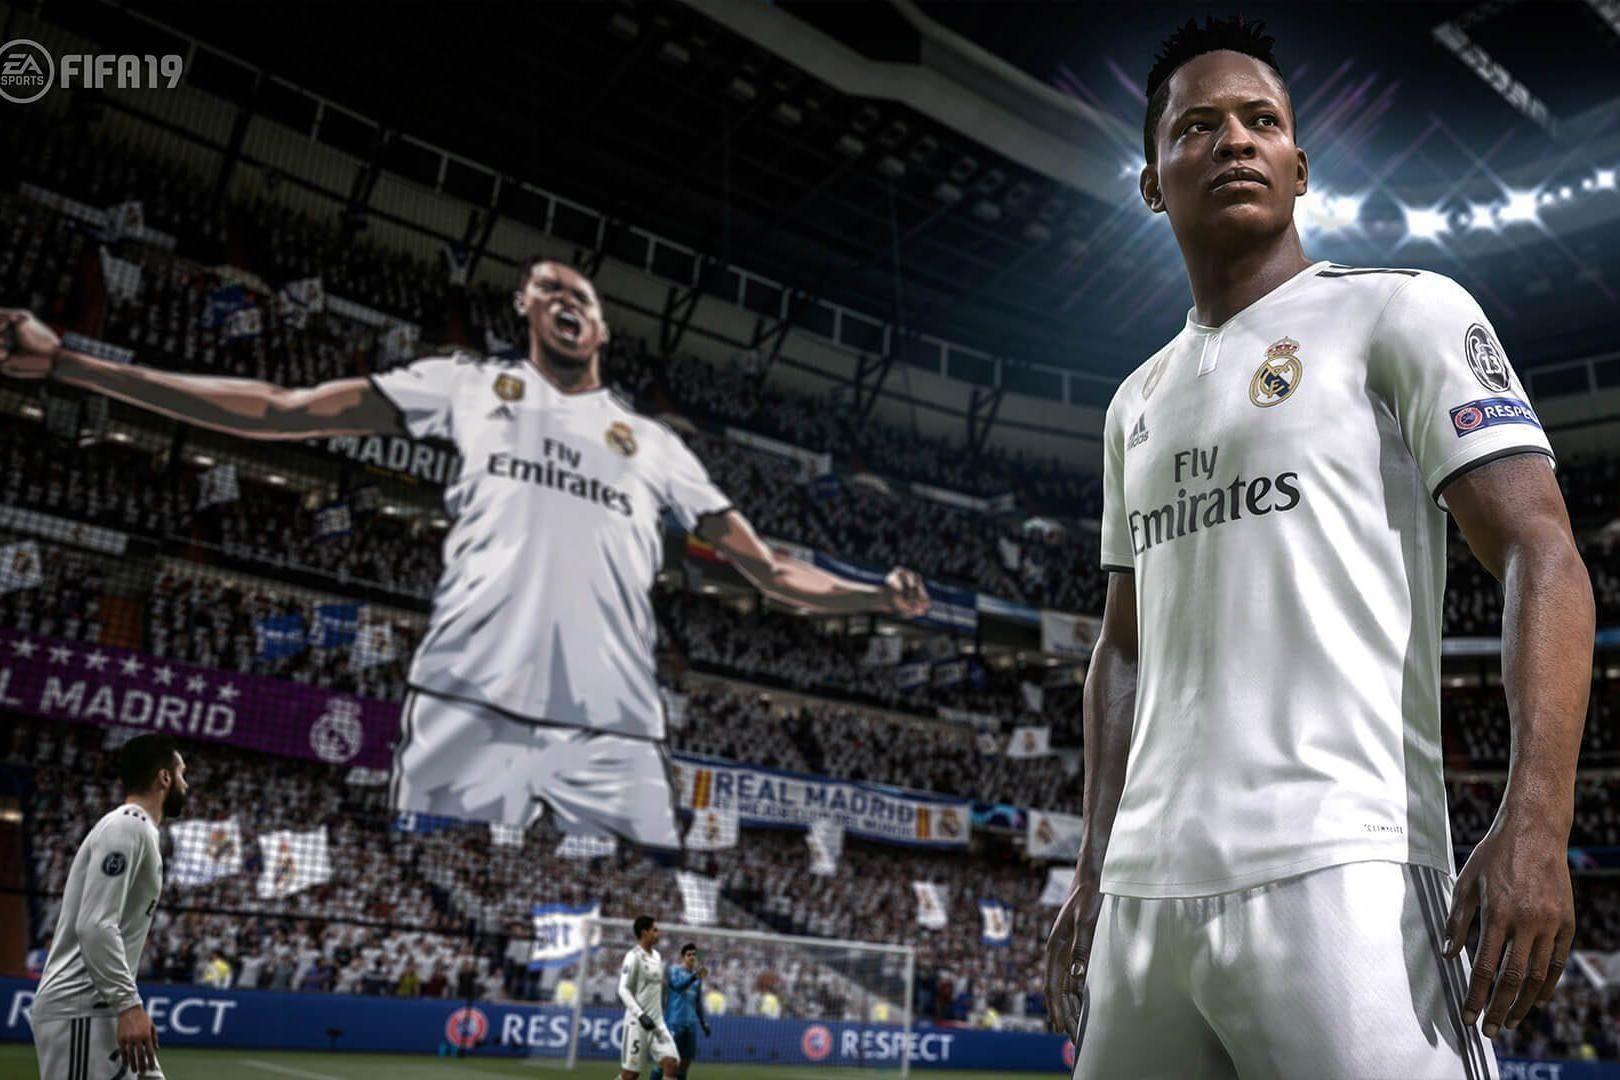 Alex Hunter returns in FIFA 19